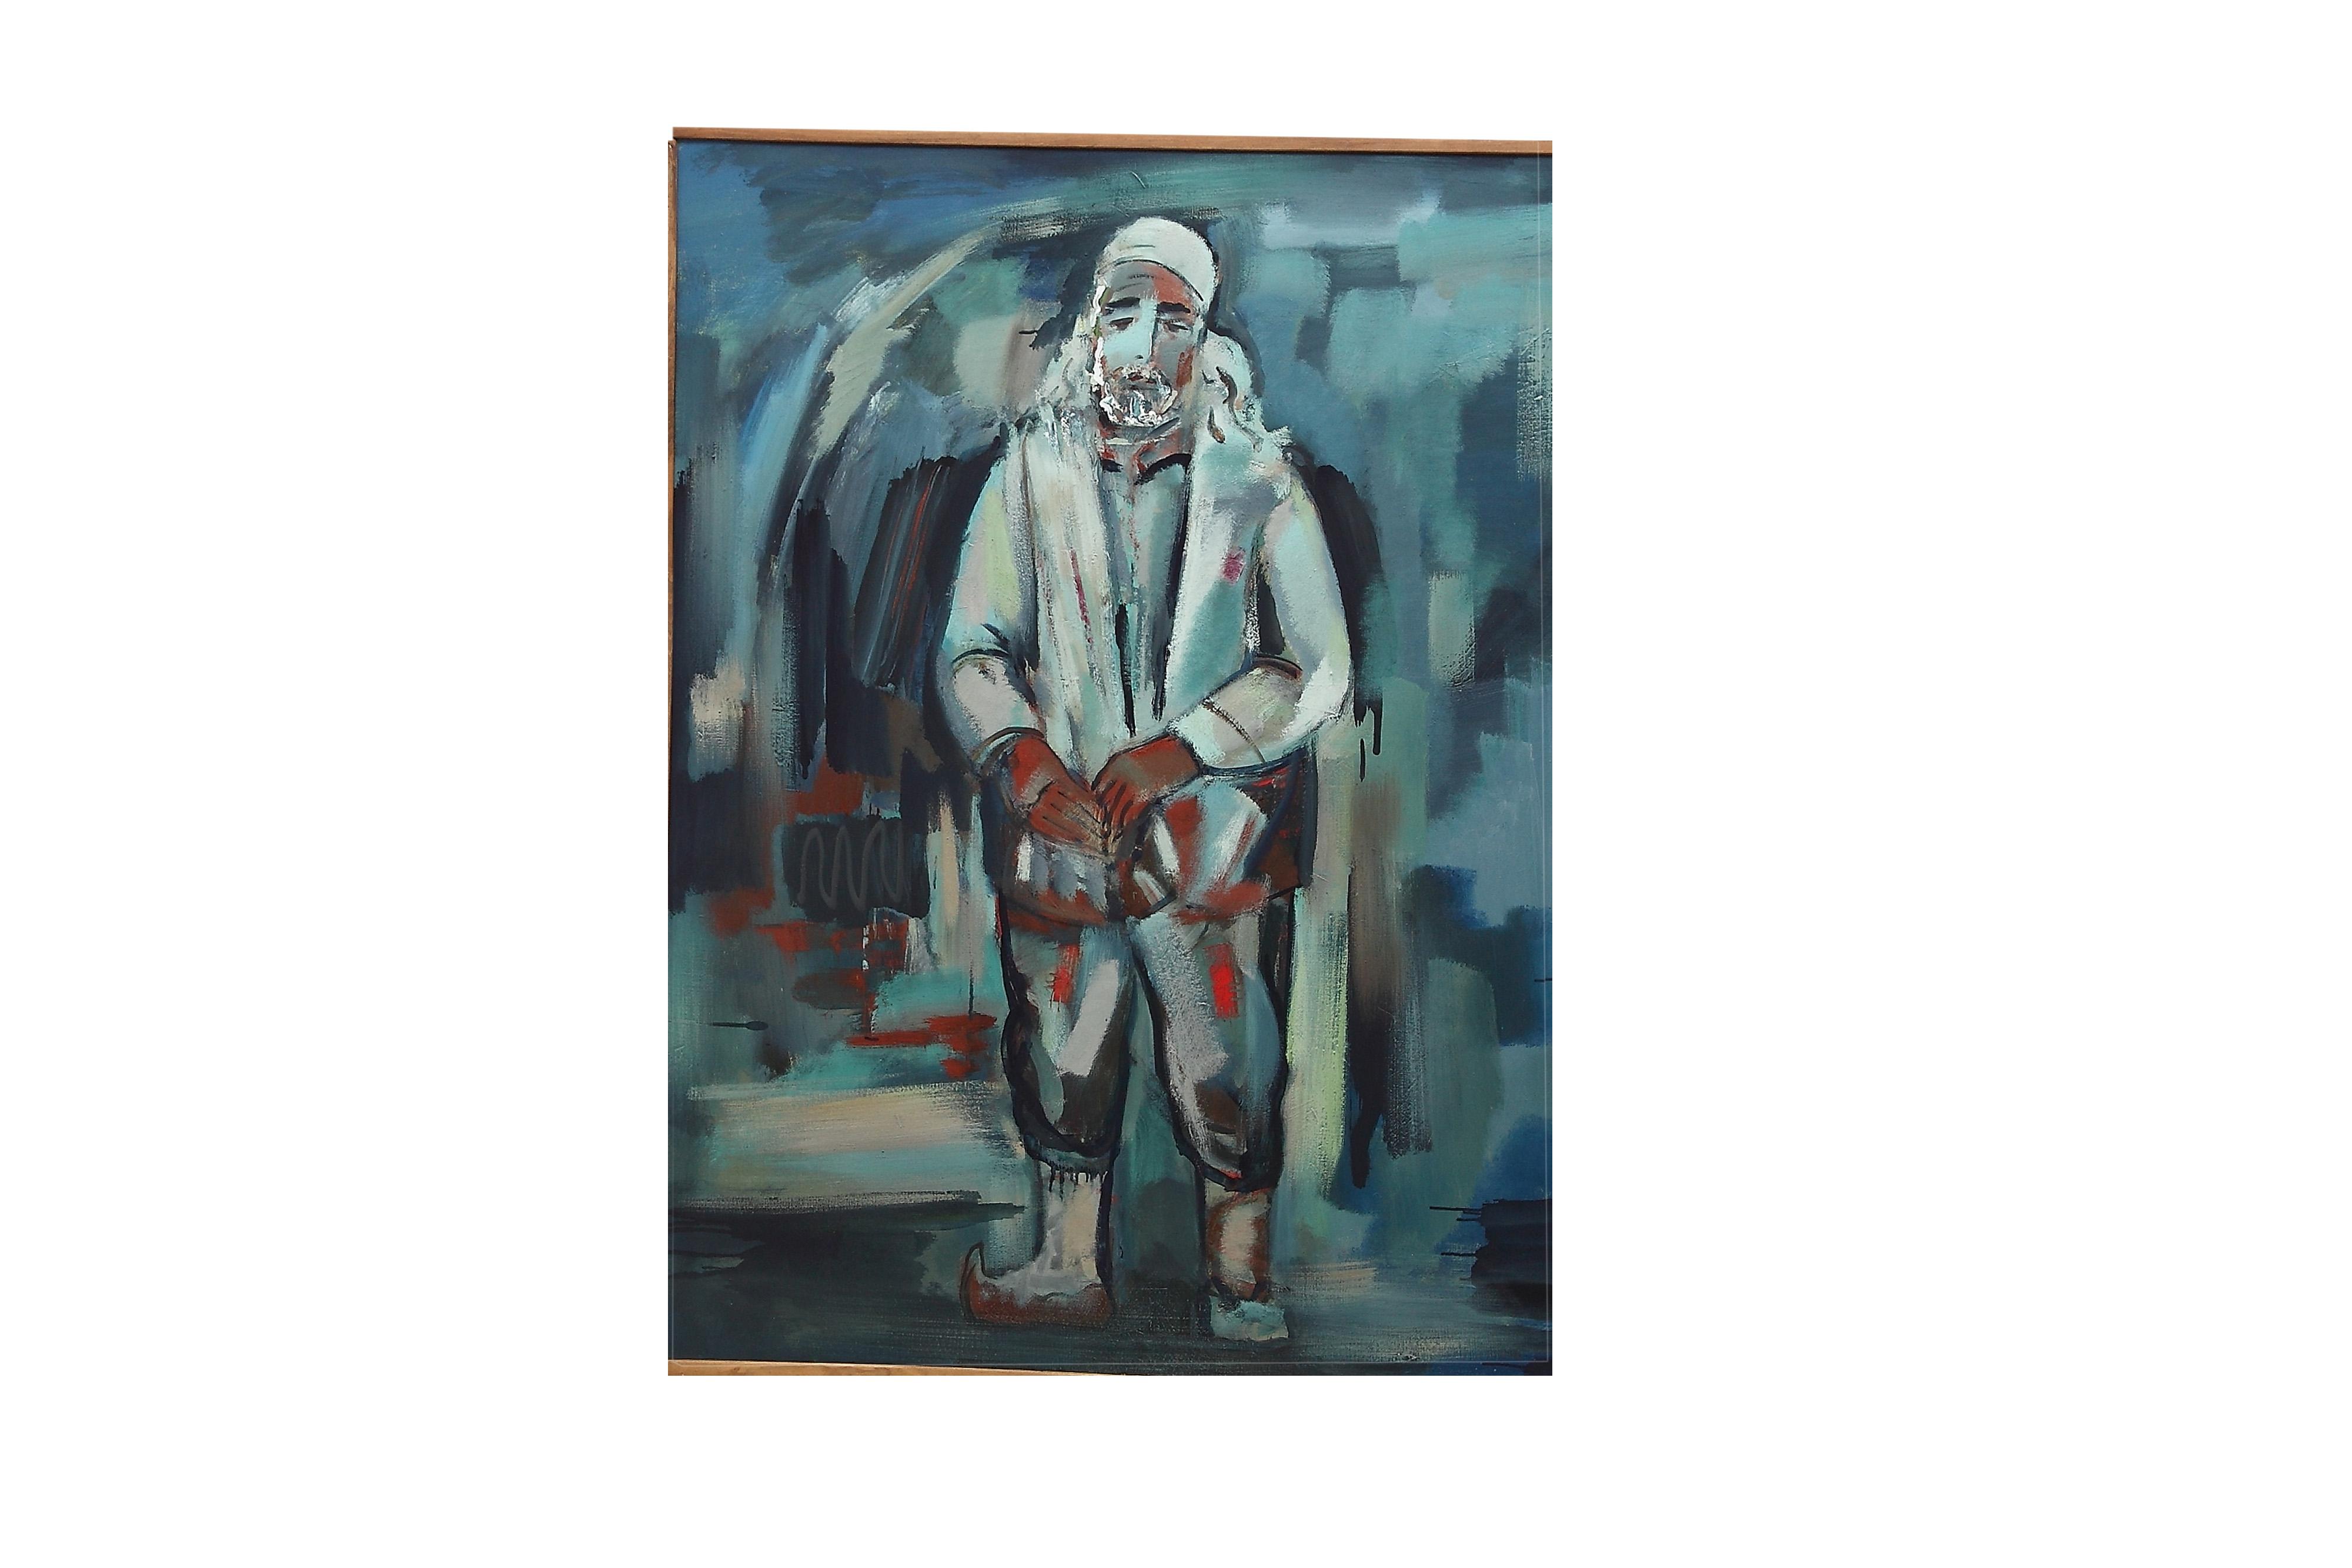 120х100 х.м. 2011 - Mnatsakan, 120x100, oil on canvas, 2011